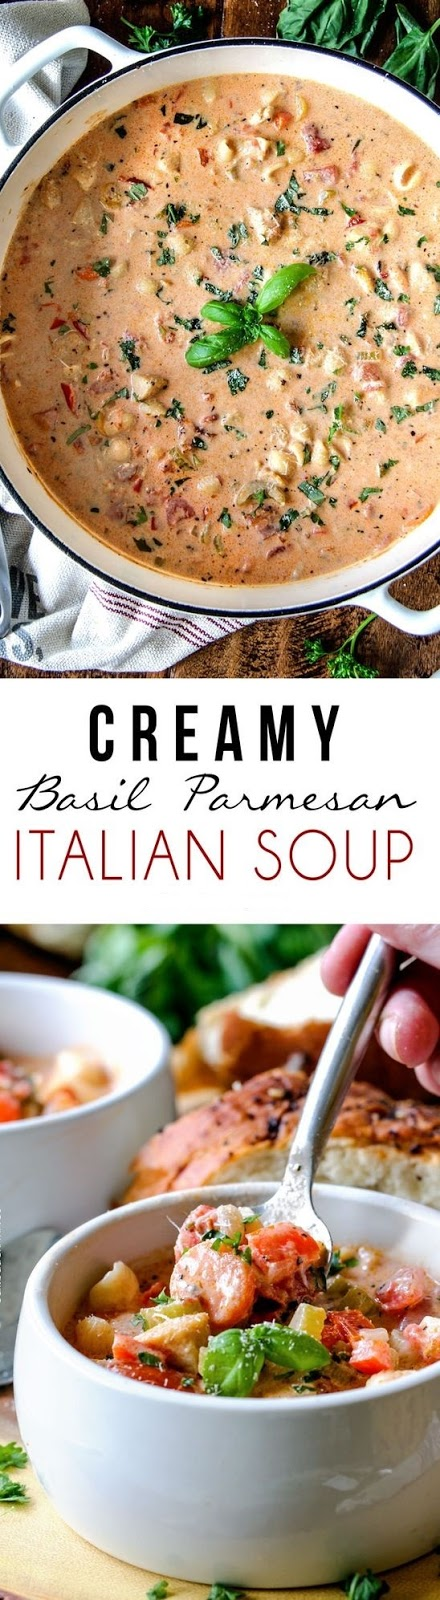 Italian Soup tastes